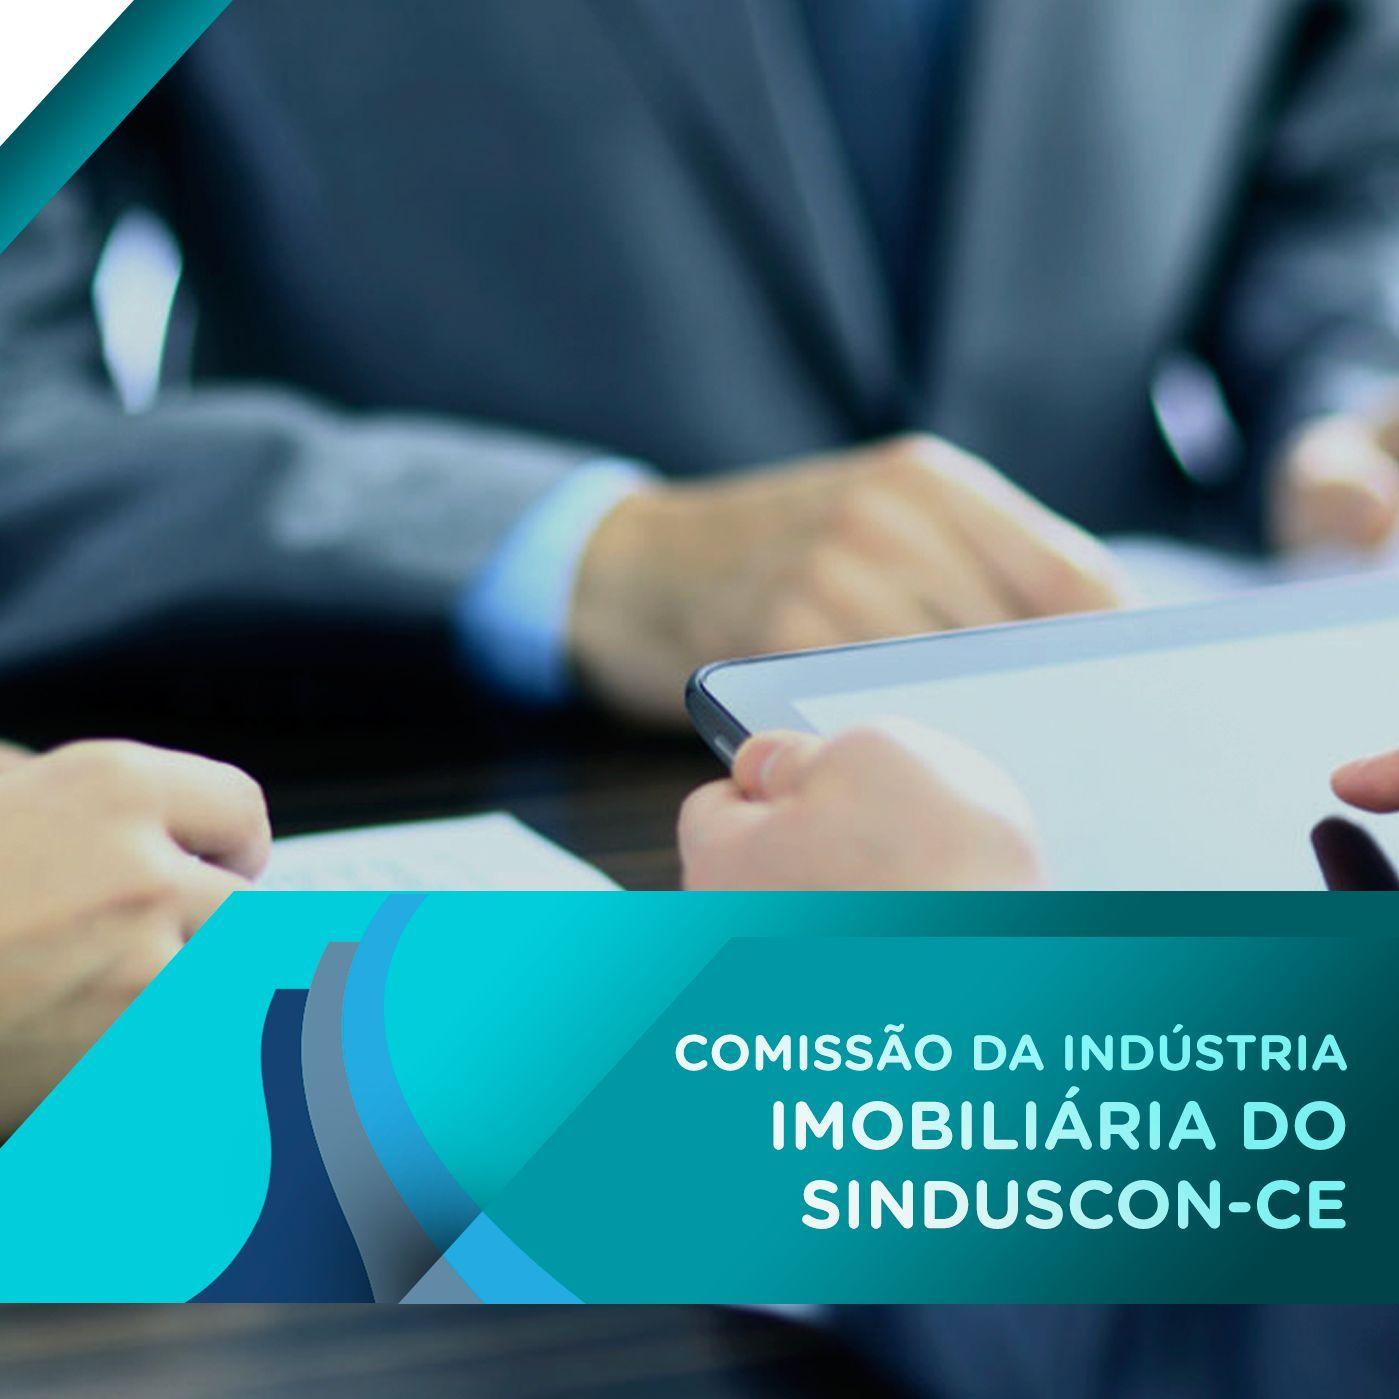 SindusconNoAr08 - Comissão da Industria Imobiliária